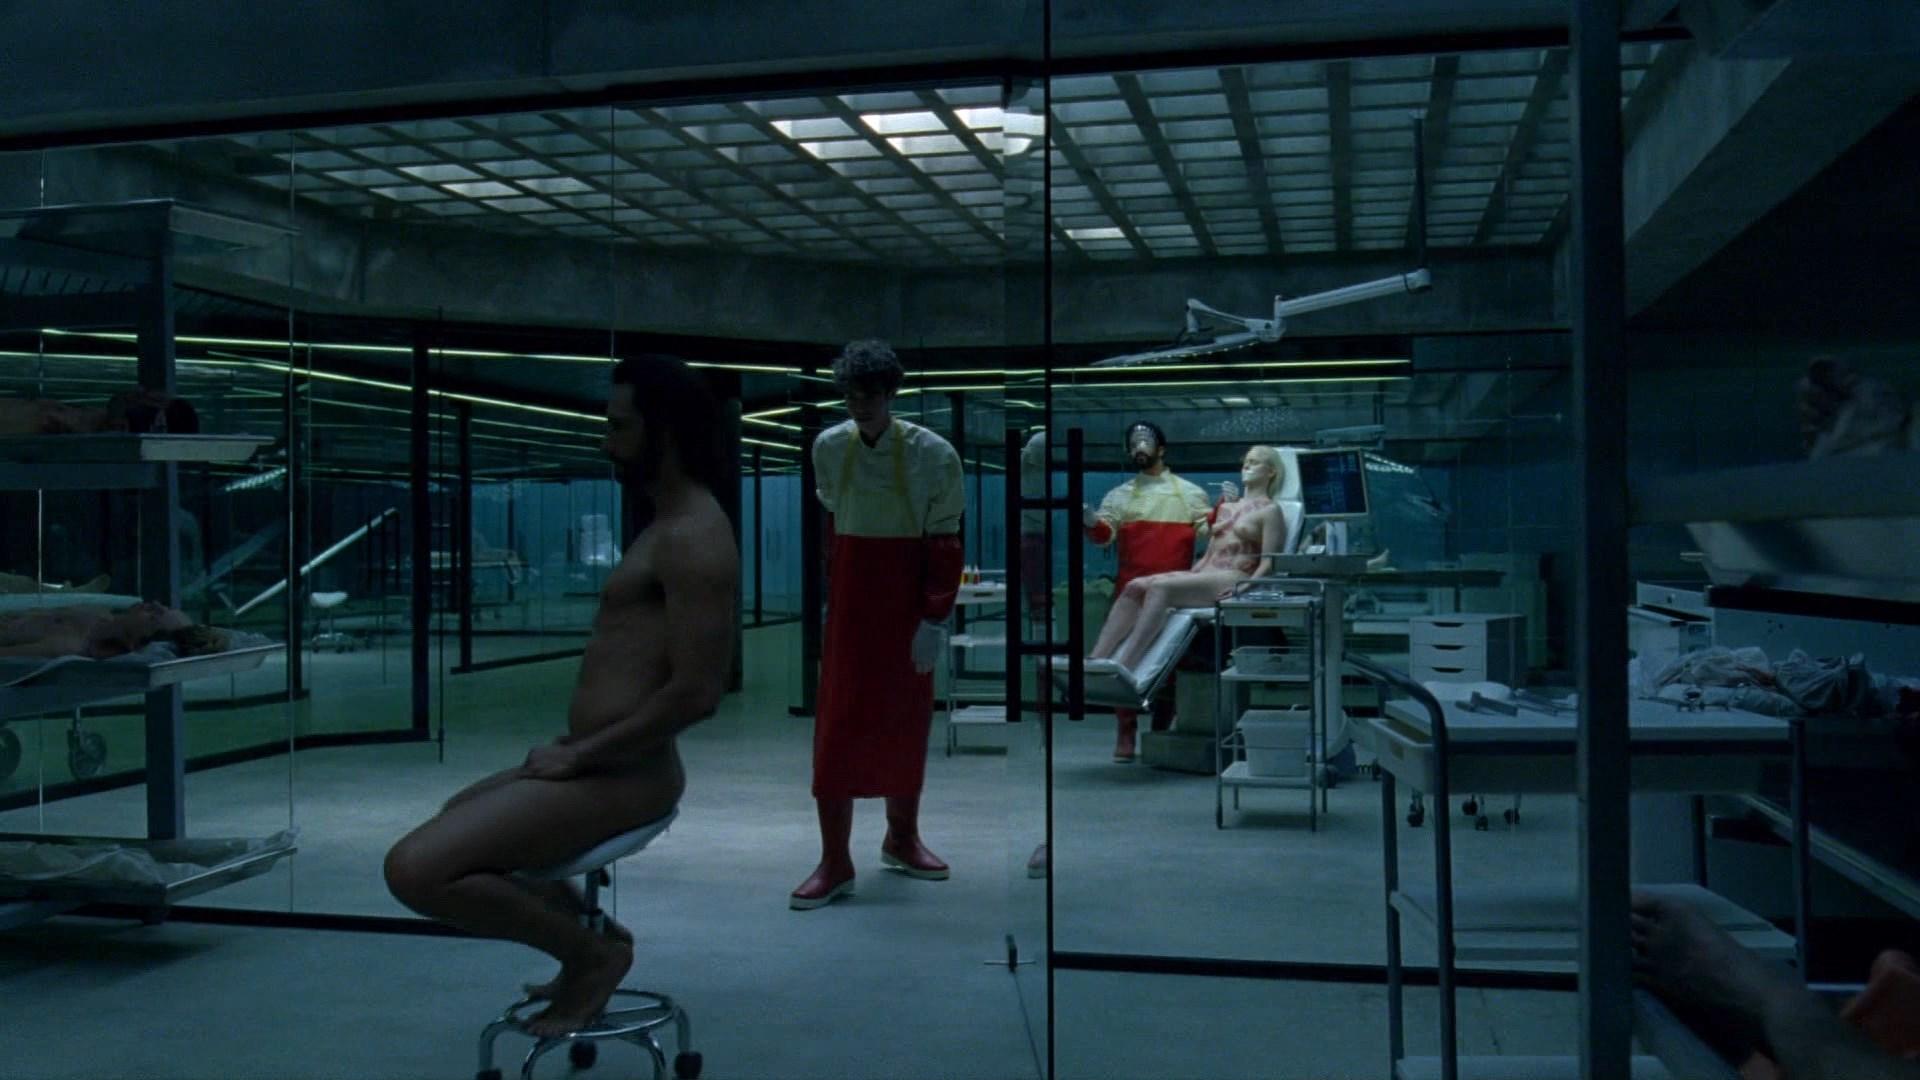 Ingrid Bolsø Berdal Naked ingrid bolsø berdal nude – westworld (2016) s01e10 hd 1080p